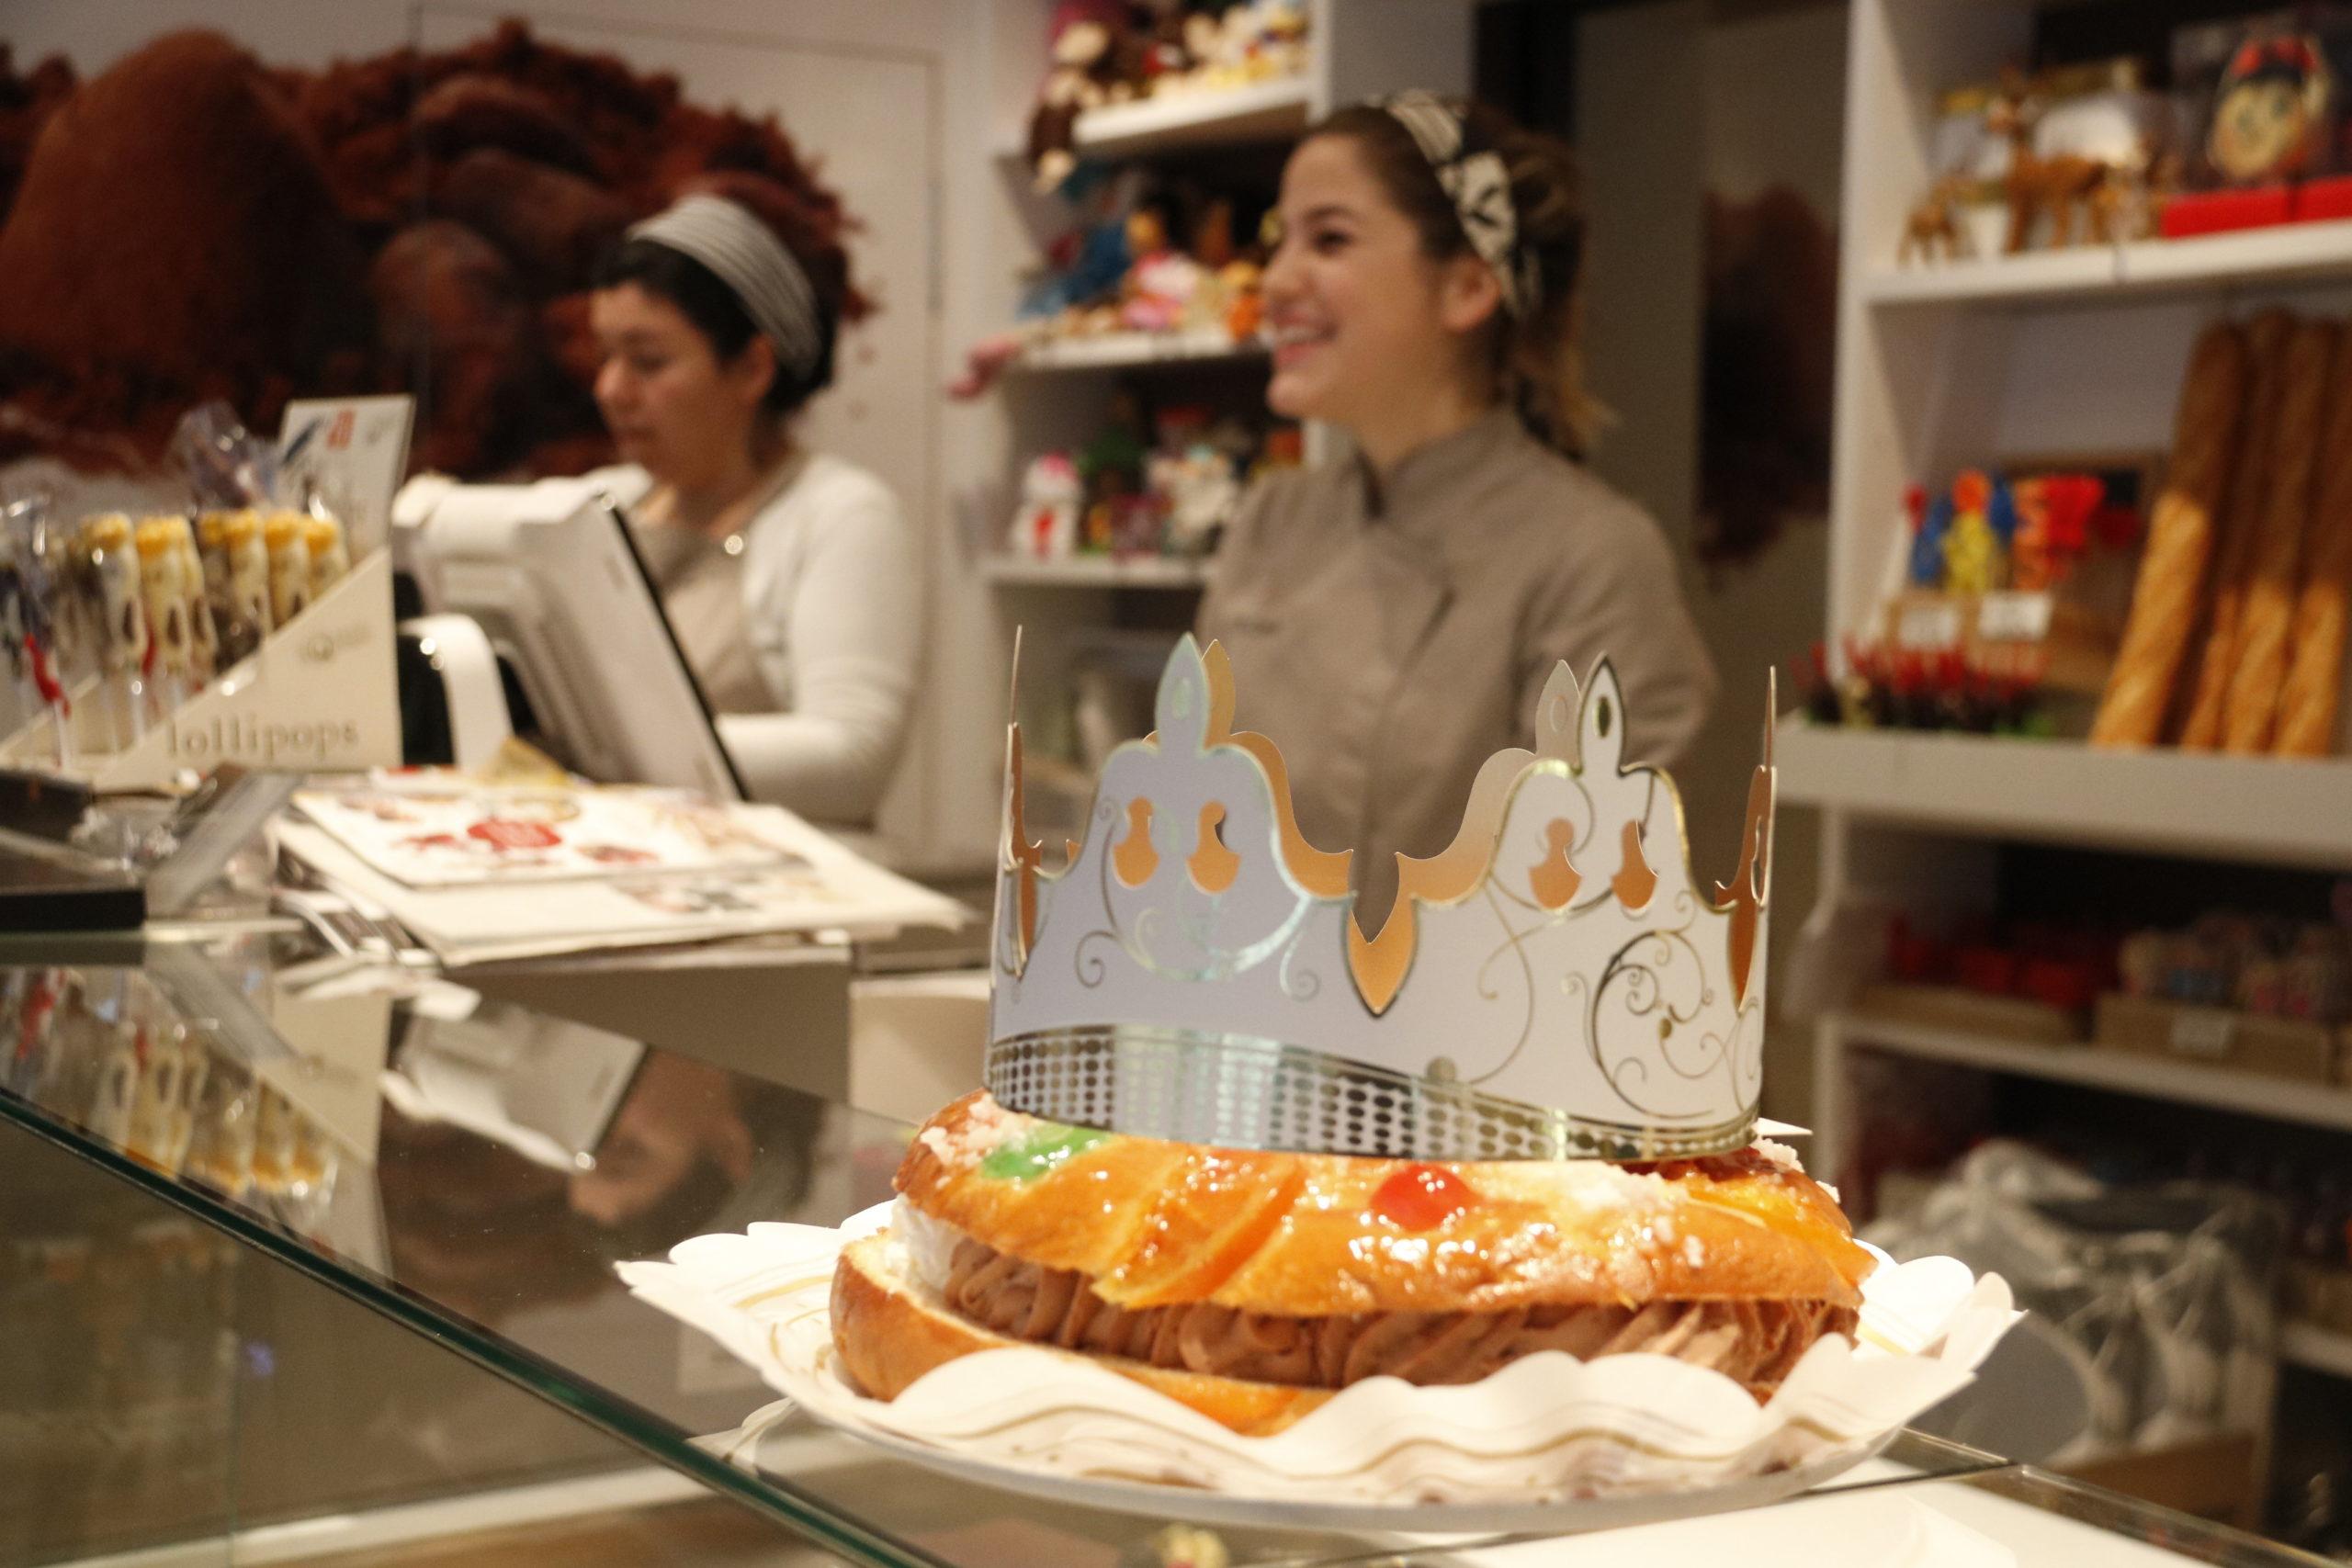 Un tortell ja acabat a la pastisseria El Cigne de Manresa | ACN